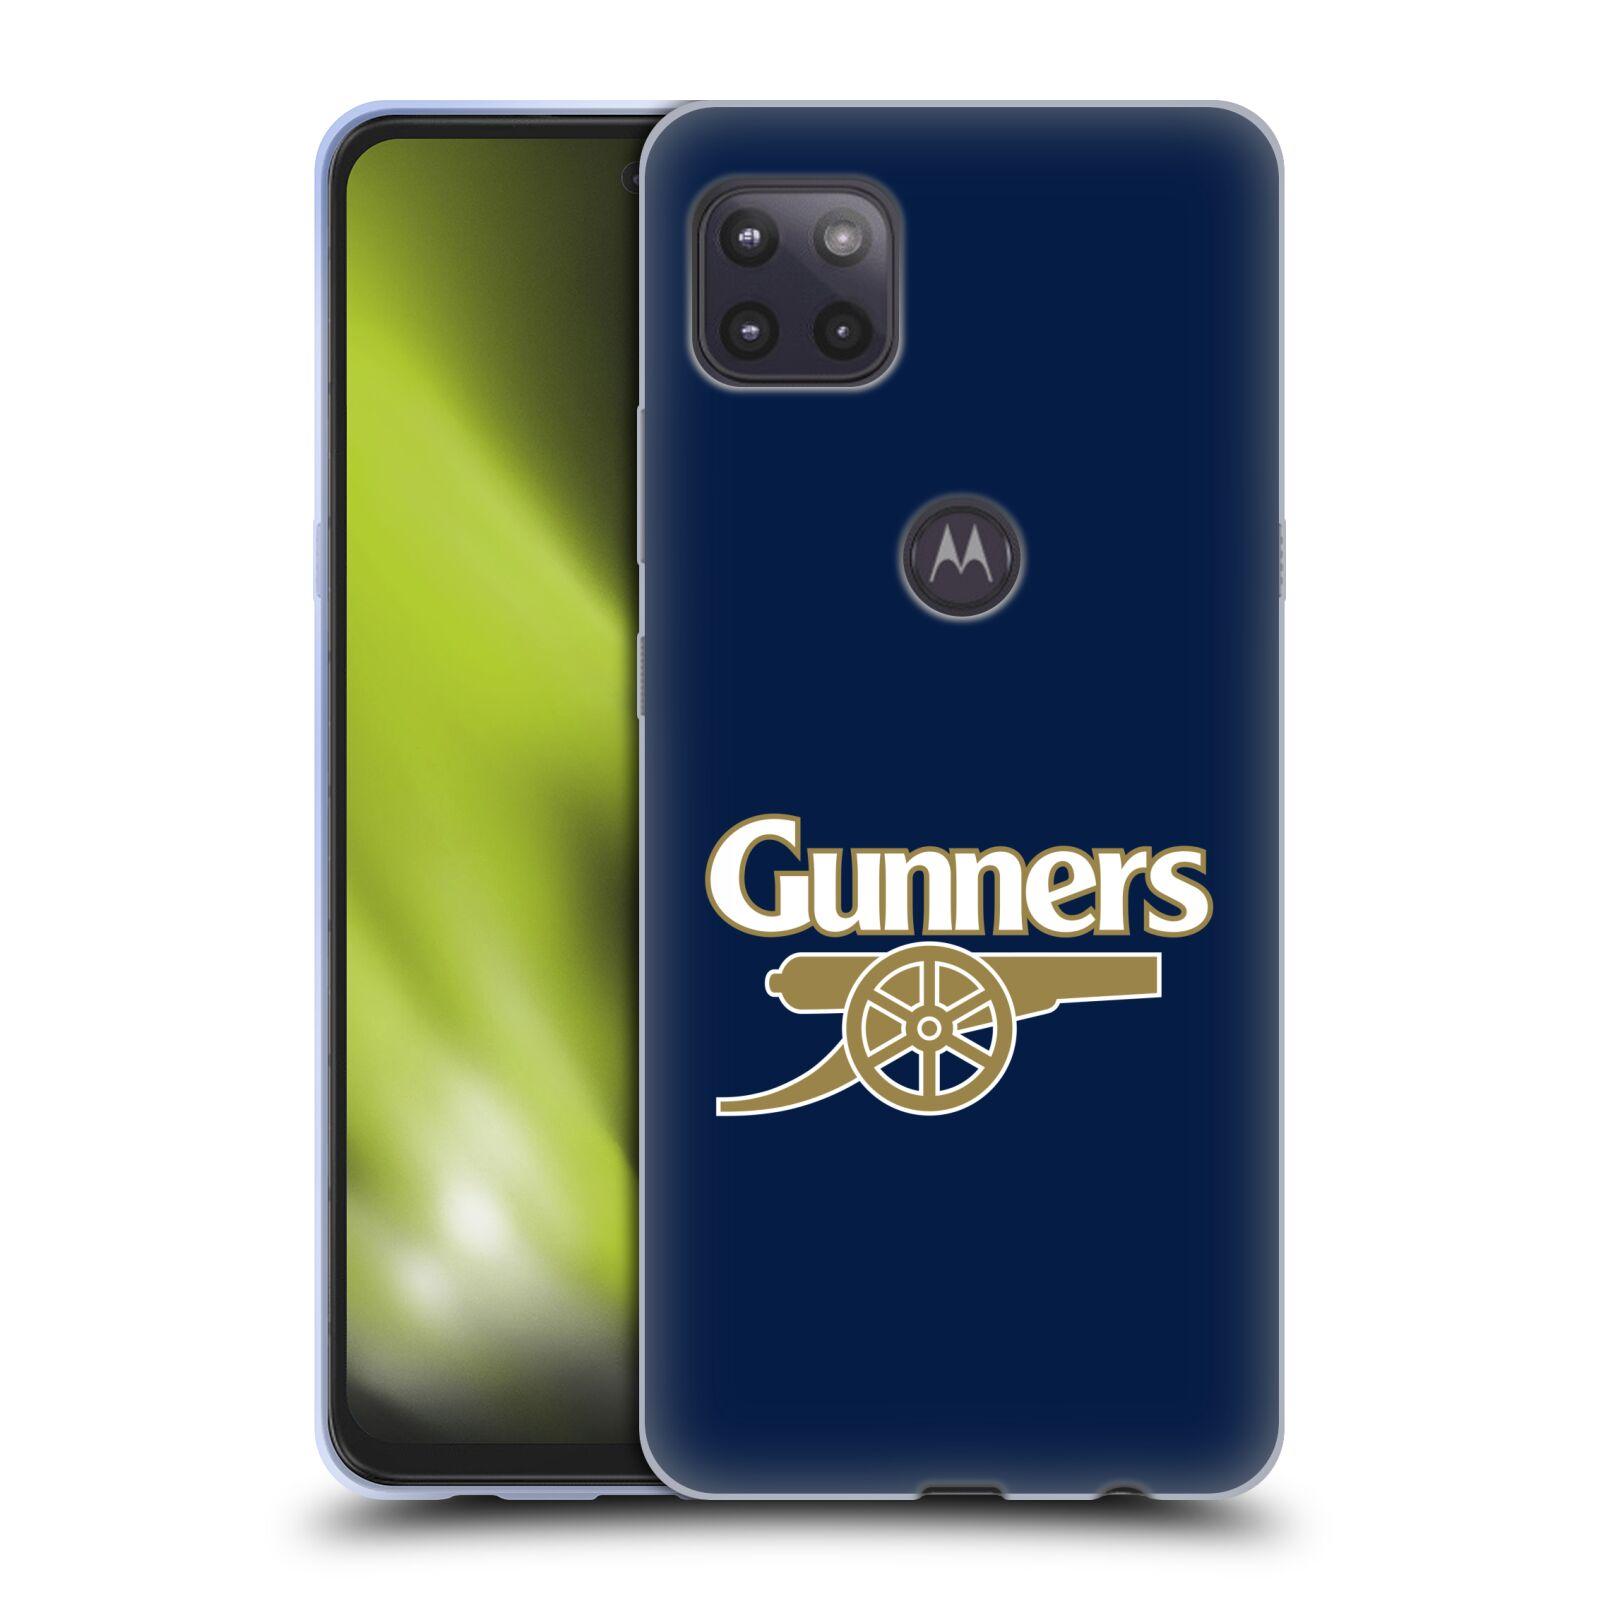 Silikonové pouzdro na mobil Motorola Moto G 5G - Head Case - Arsenal FC - Gunners